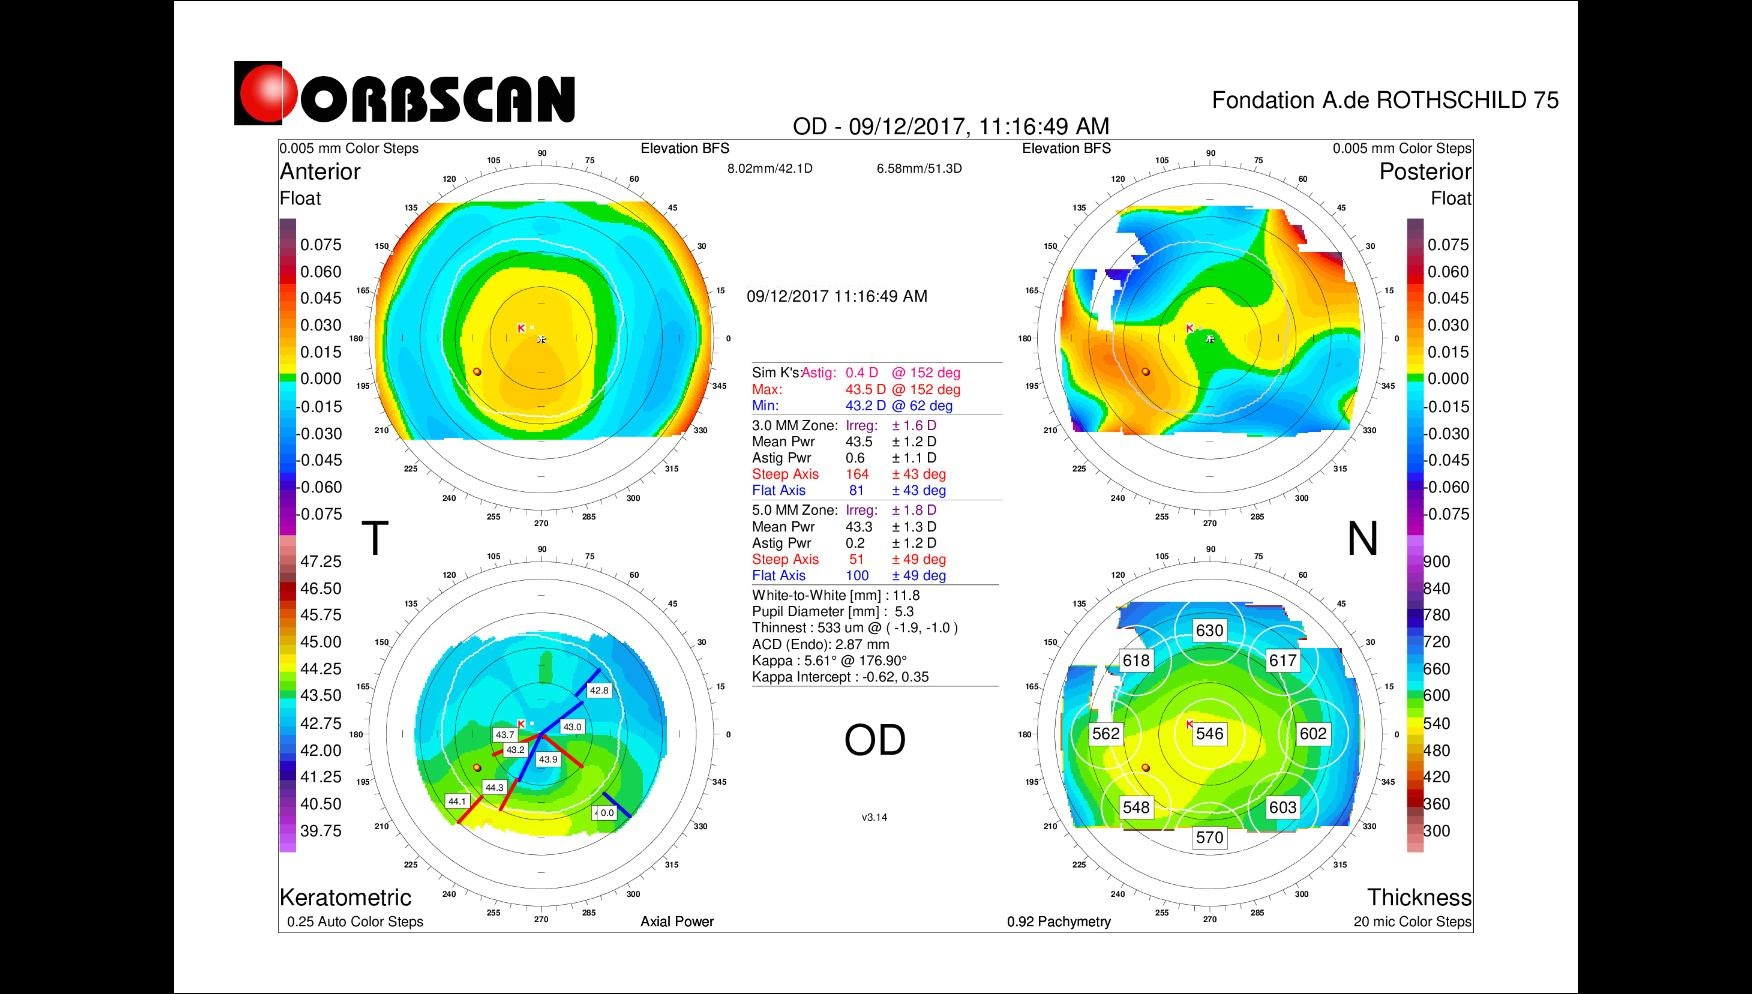 corneal irregularities on orbscan map